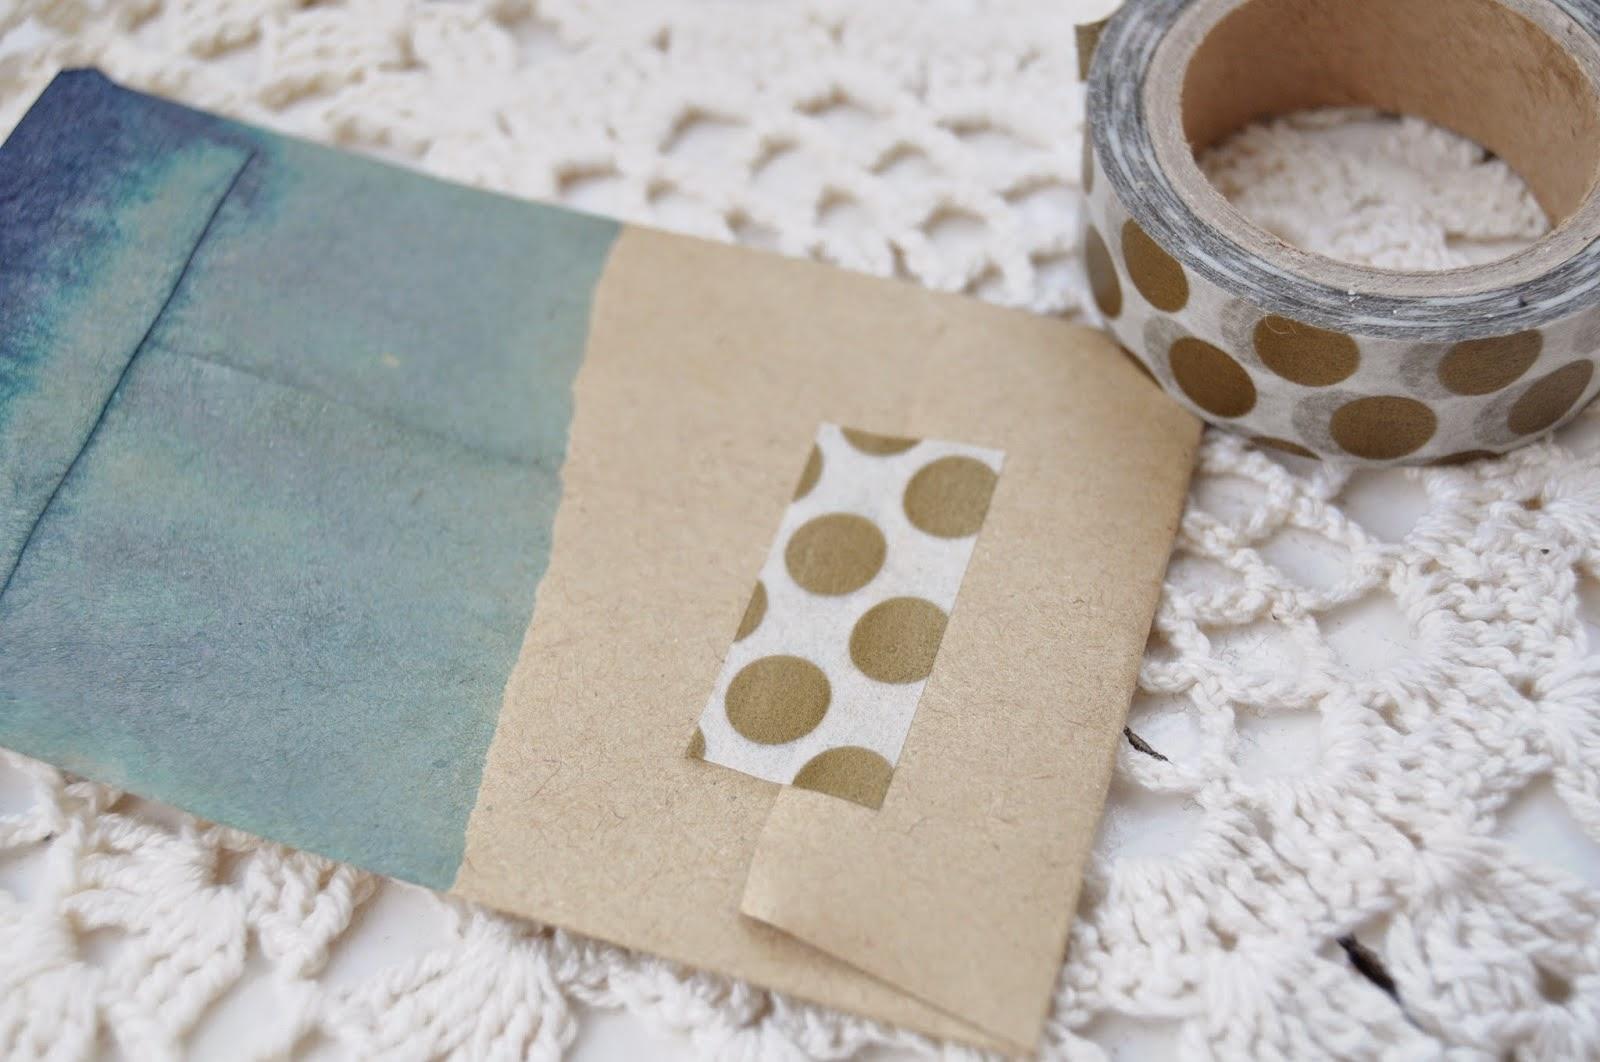 http://thecuriouslifeoflisa.blogspot.co.uk/2015/04/diy-dip-dyed-envelopes-with-food.html